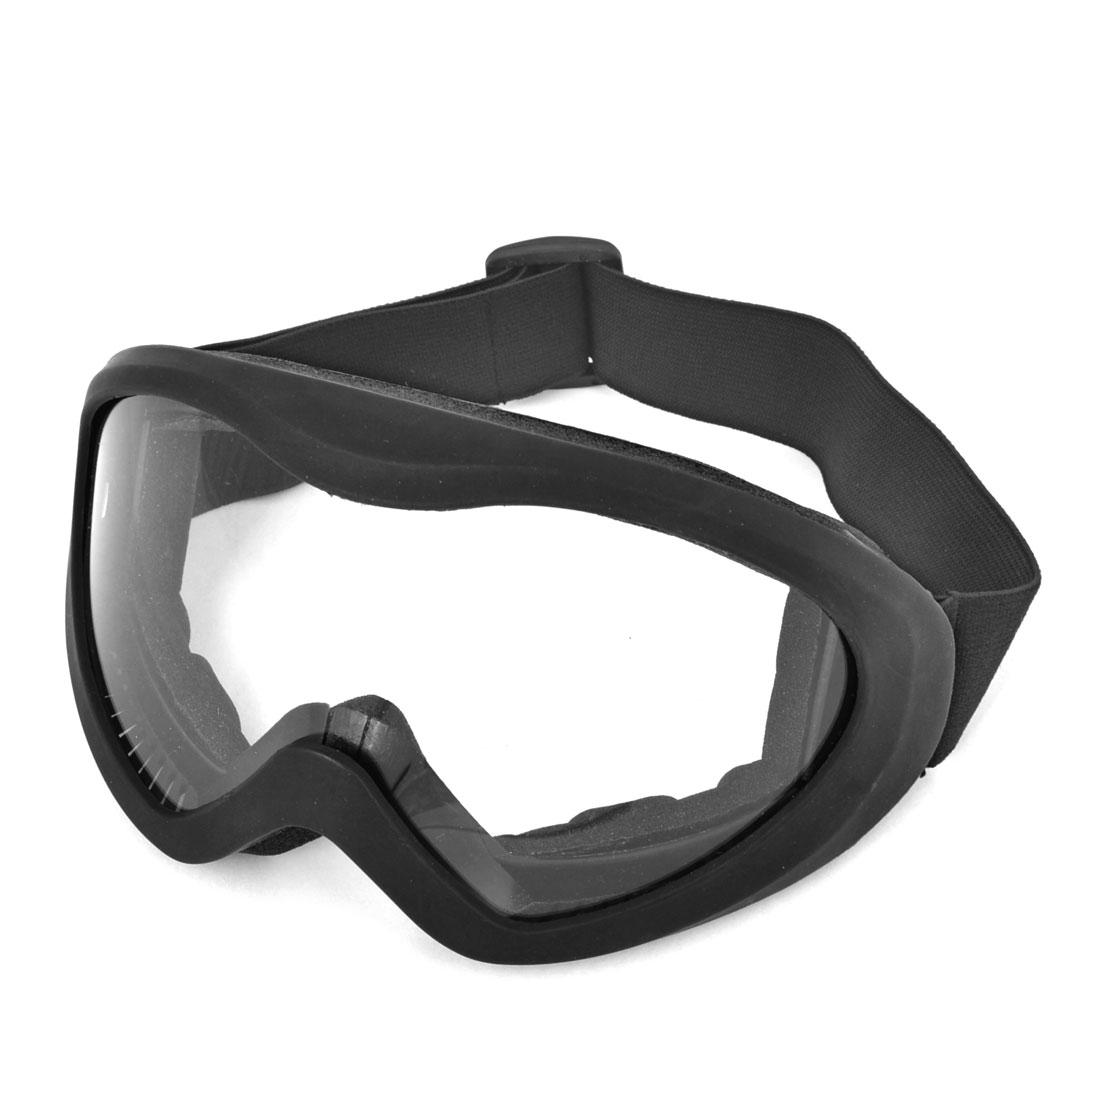 Black Winter Riding Padded Glasses Anti Fog Ski Goggles Sunglasses